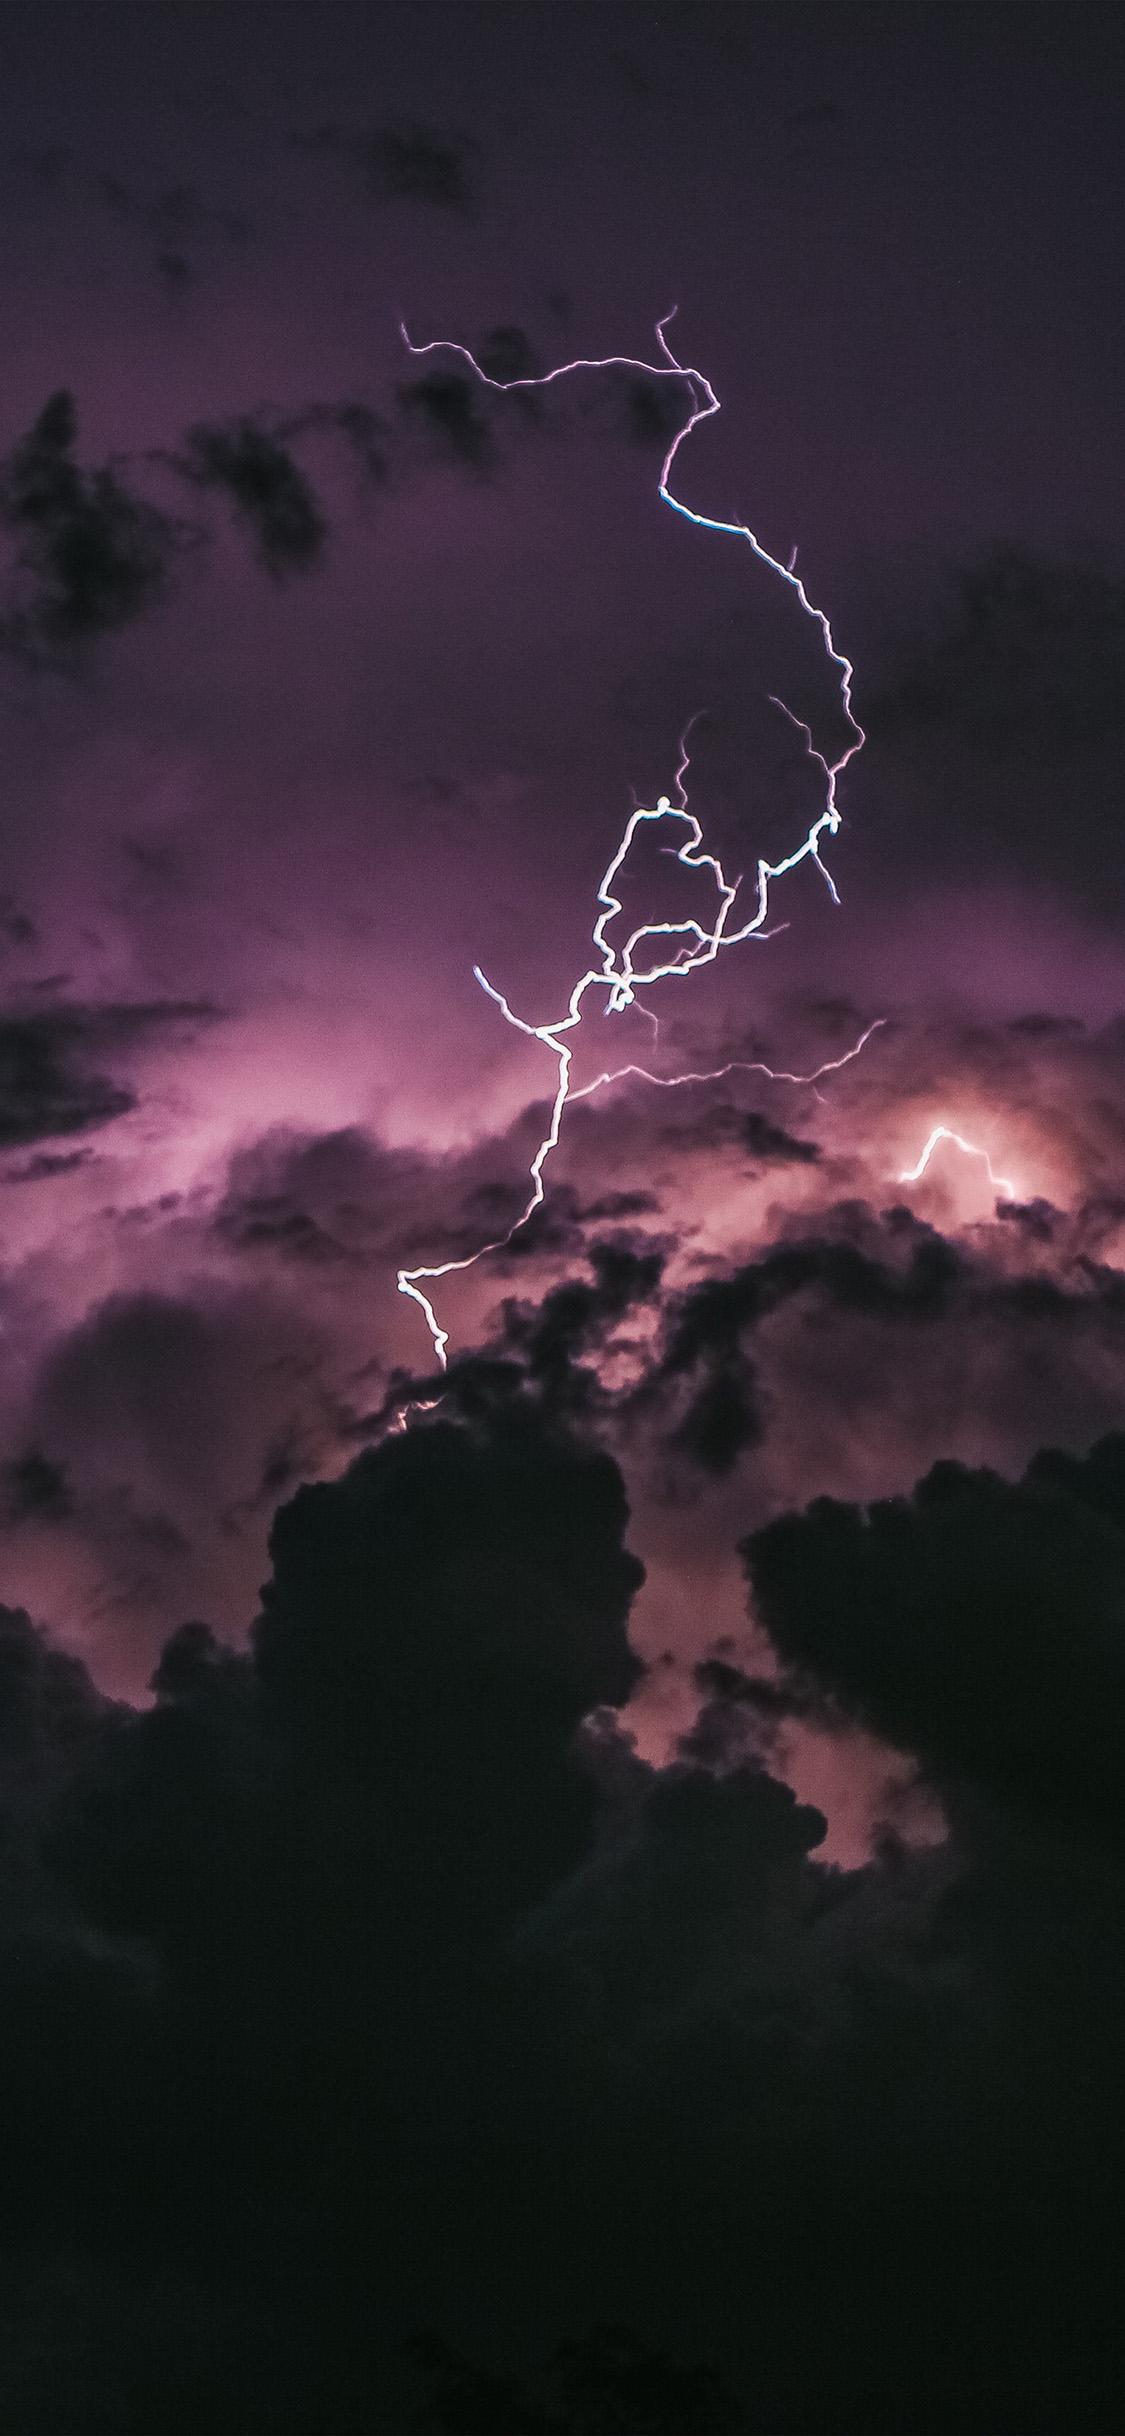 iPhonexpapers.com-Apple-iPhone-wallpaper-ny20-cloud-rain-thunder-sky-nature